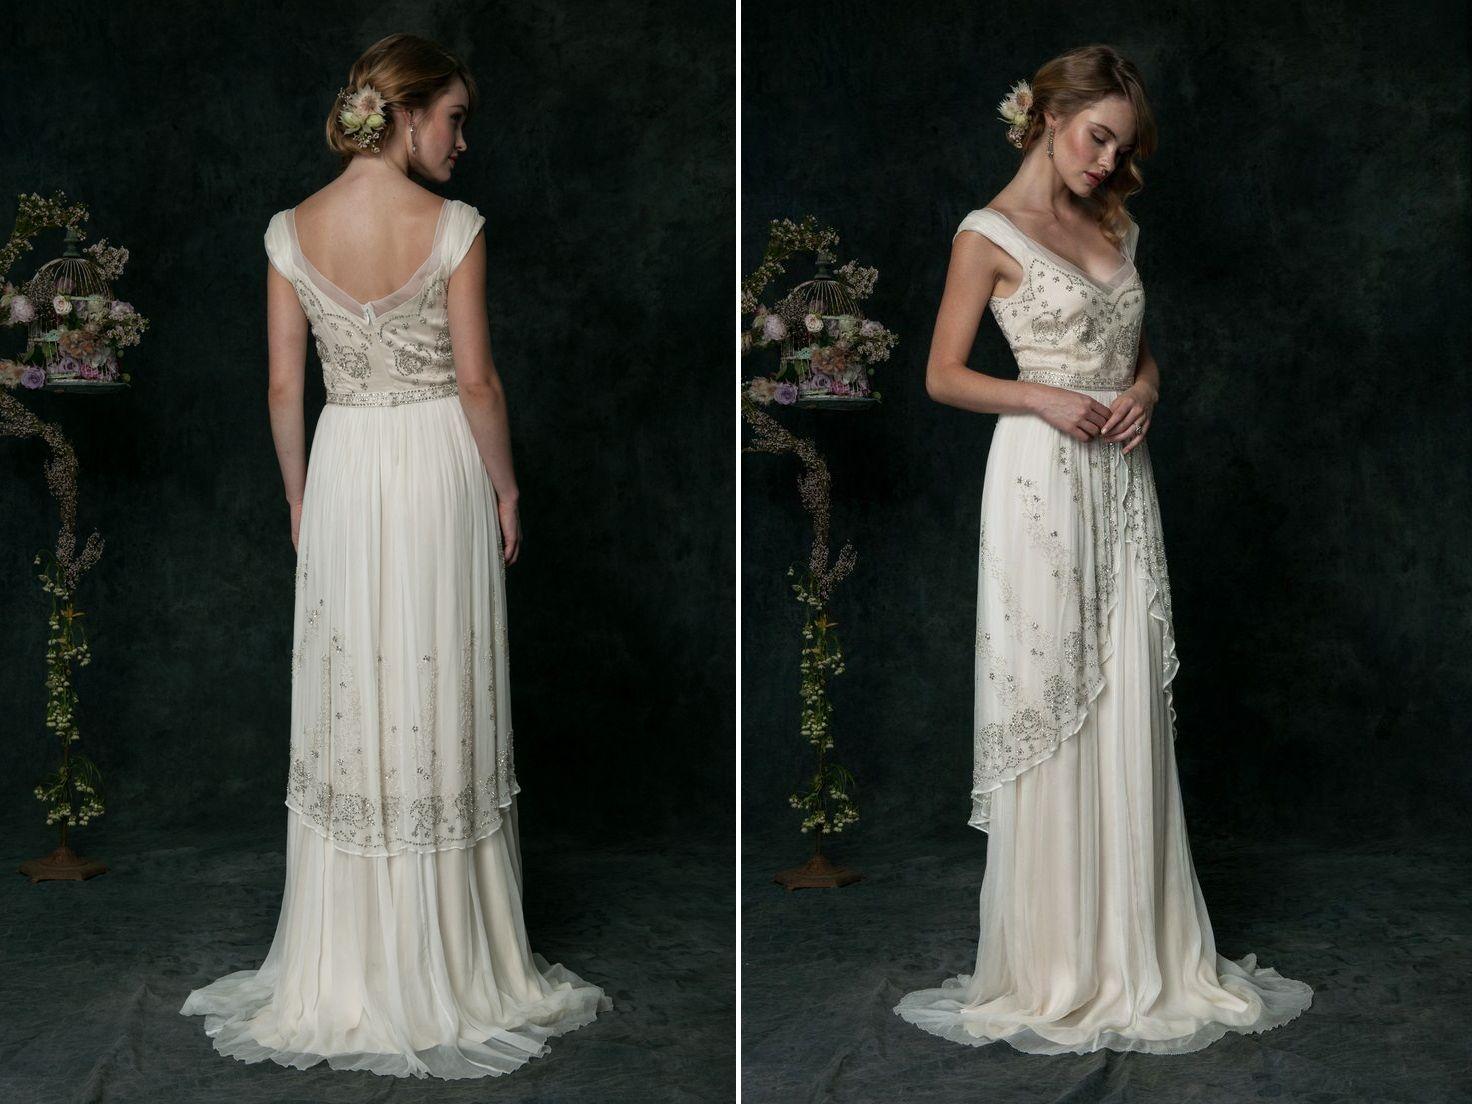 The Romantic 2016 Bridal Collection From Saja Wedding Elegant Bridal Gown Bridal Style Art Nouveau Wedding Dress